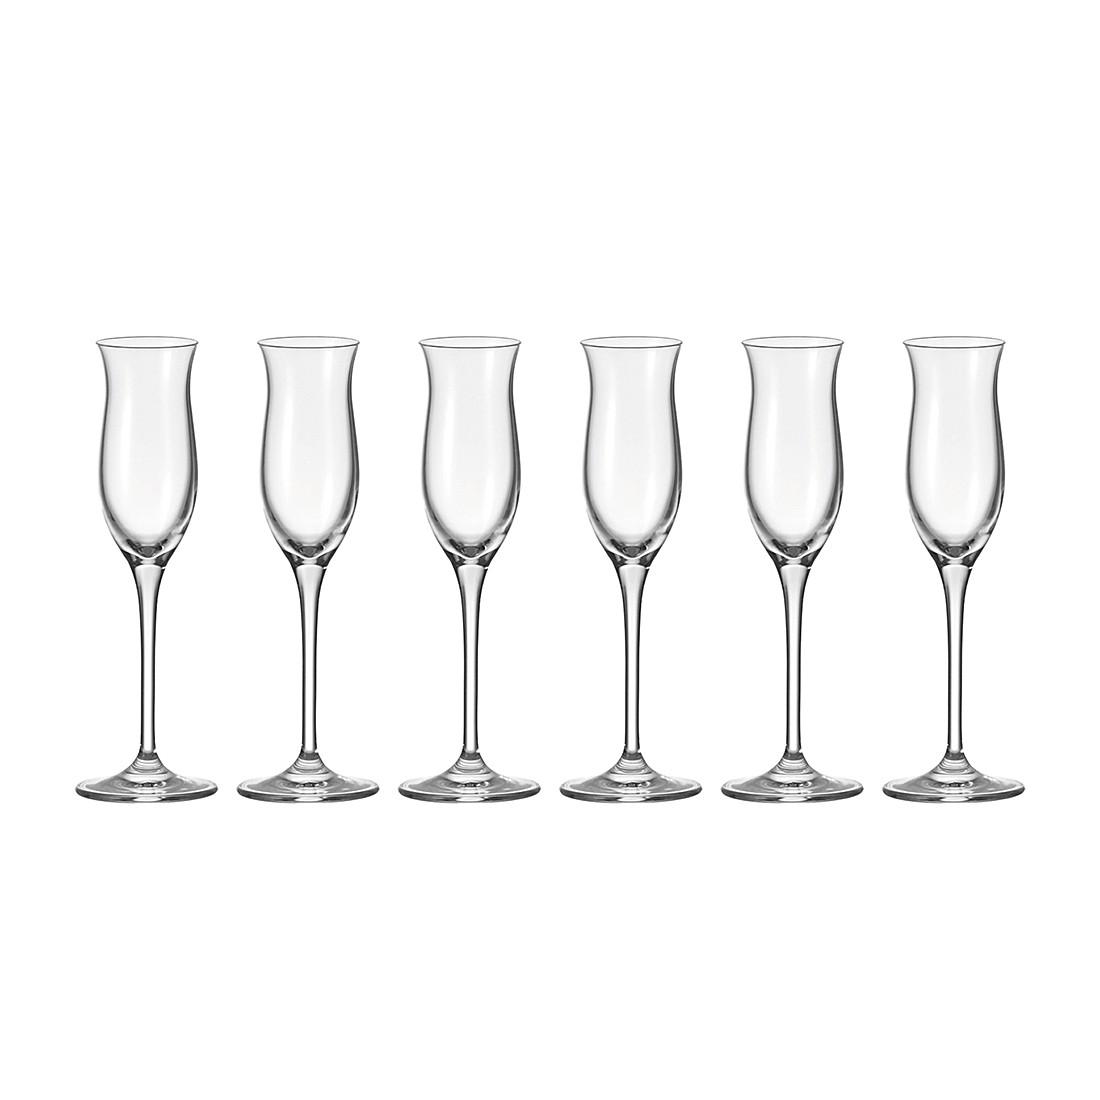 Grappaglas Cheers (6er-Set), Leonardo online bestellen